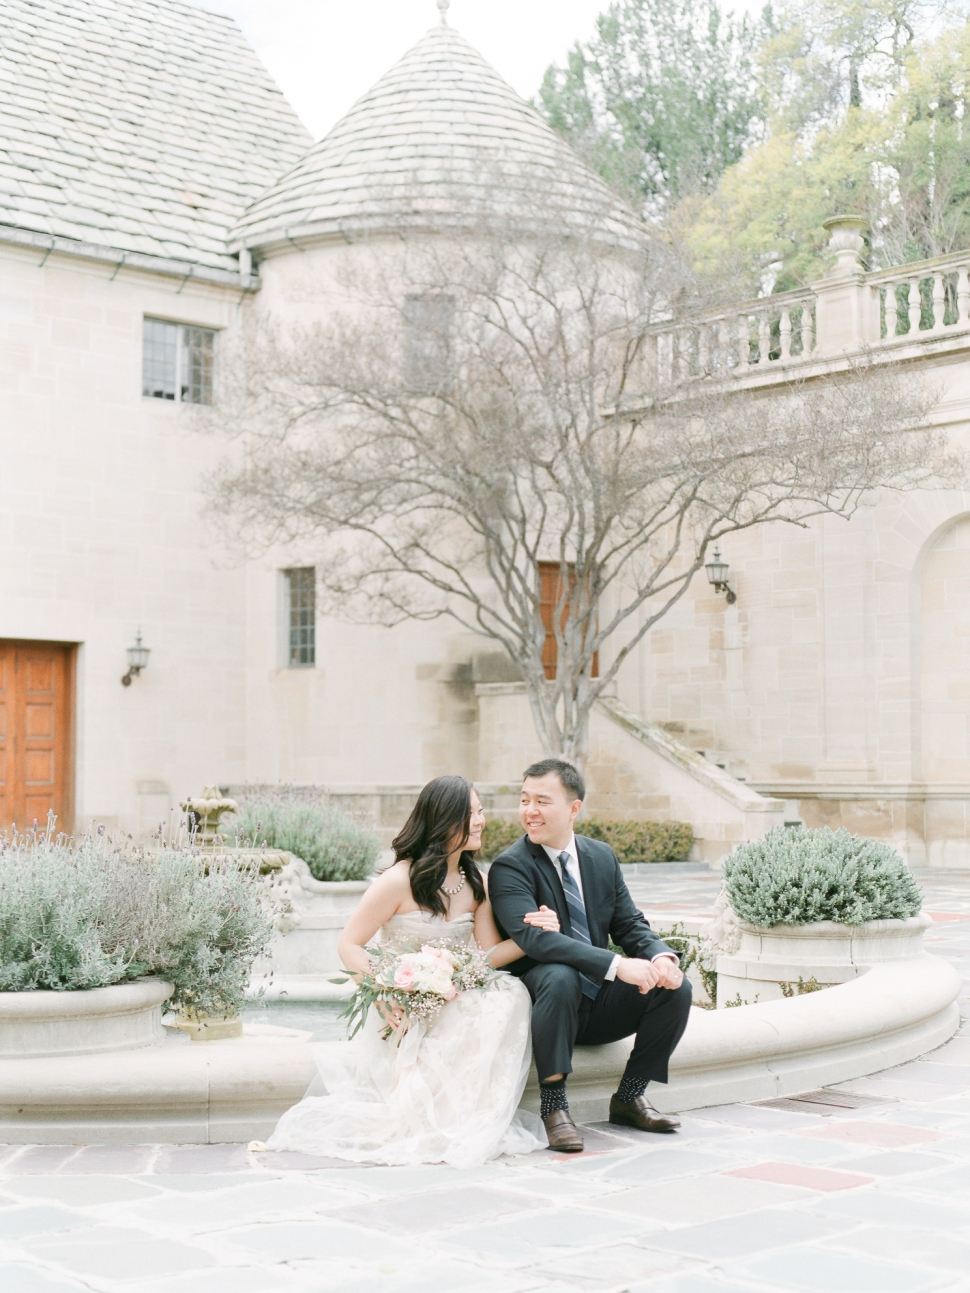 Southern-California-Wedding-Photographer-Cassi-Claire-Greystone-Mansion-Beverly-Hills-CA-wedding_28.jpg